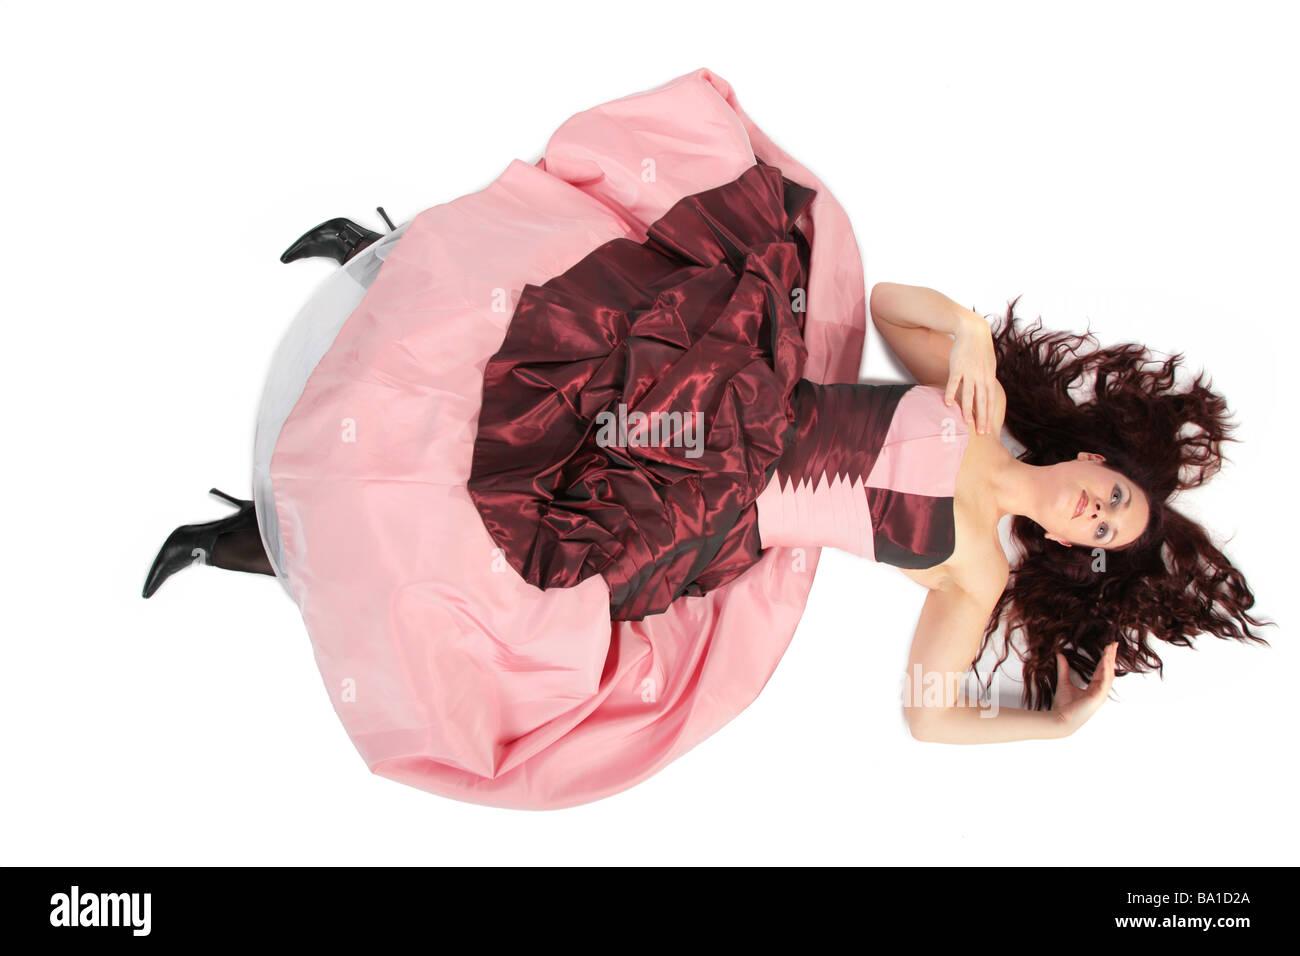 Woman In Dress With Crinoline Imágenes De Stock & Woman In Dress ...